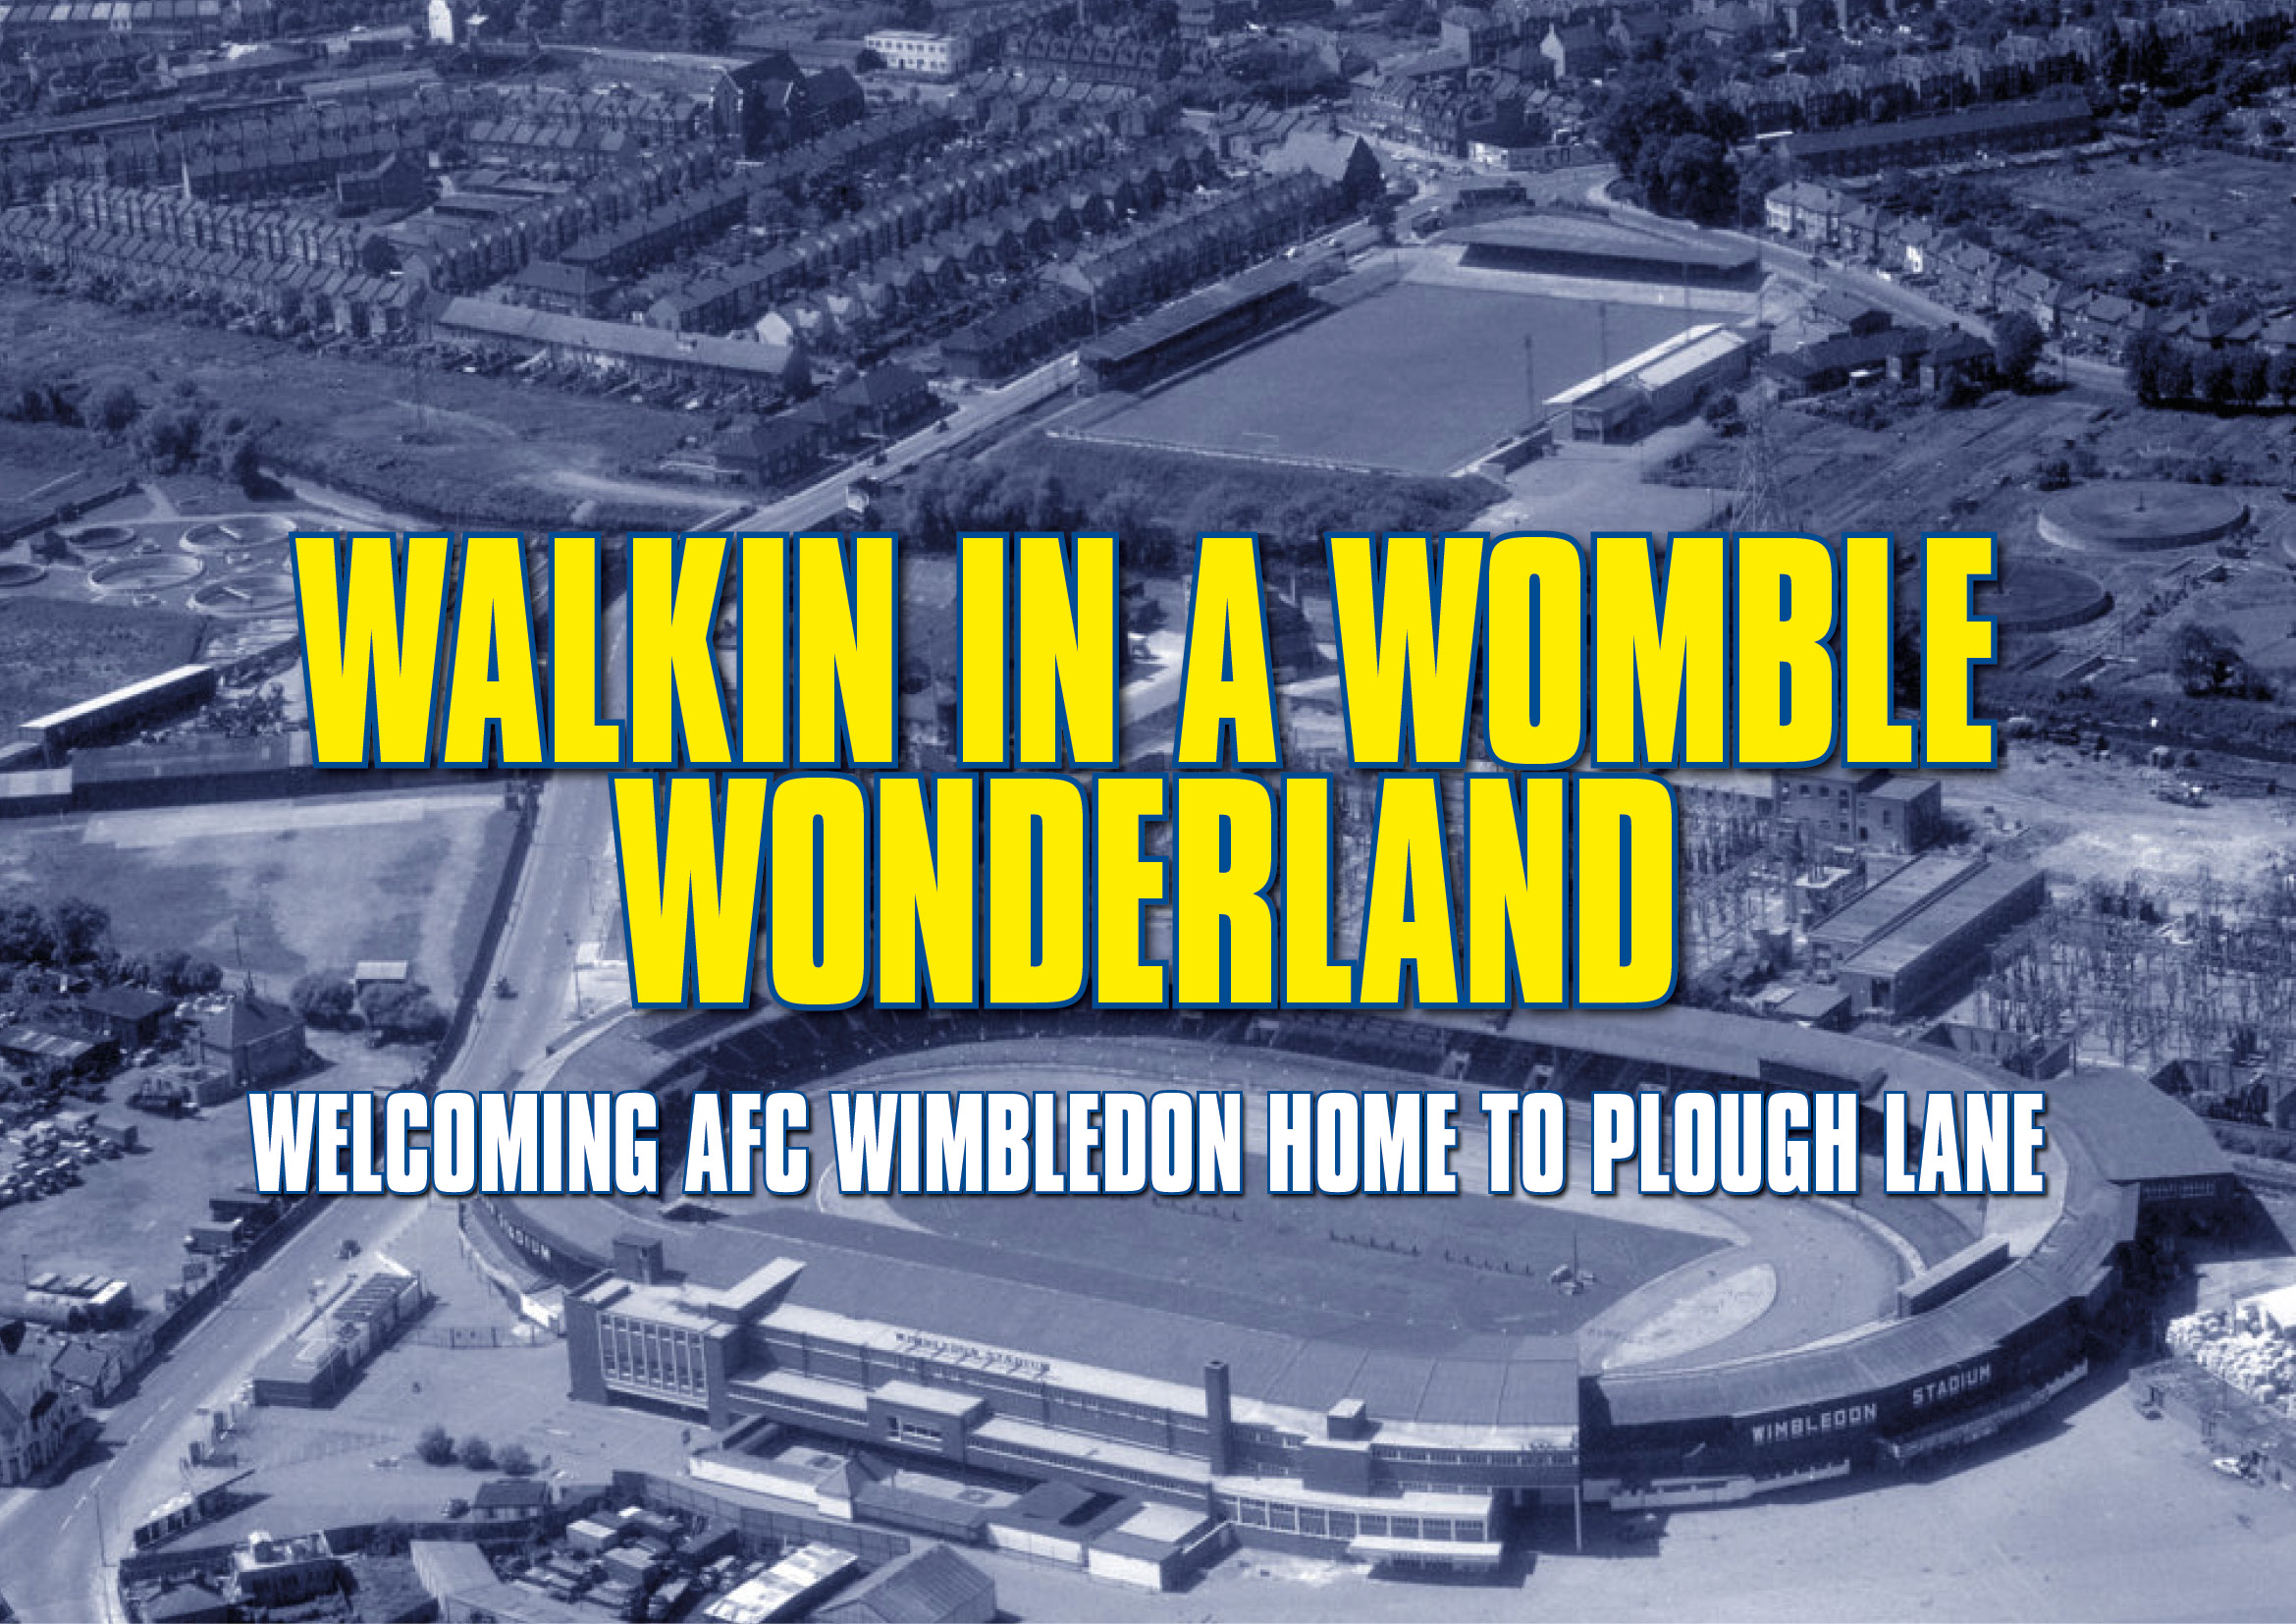 WombleWonderland